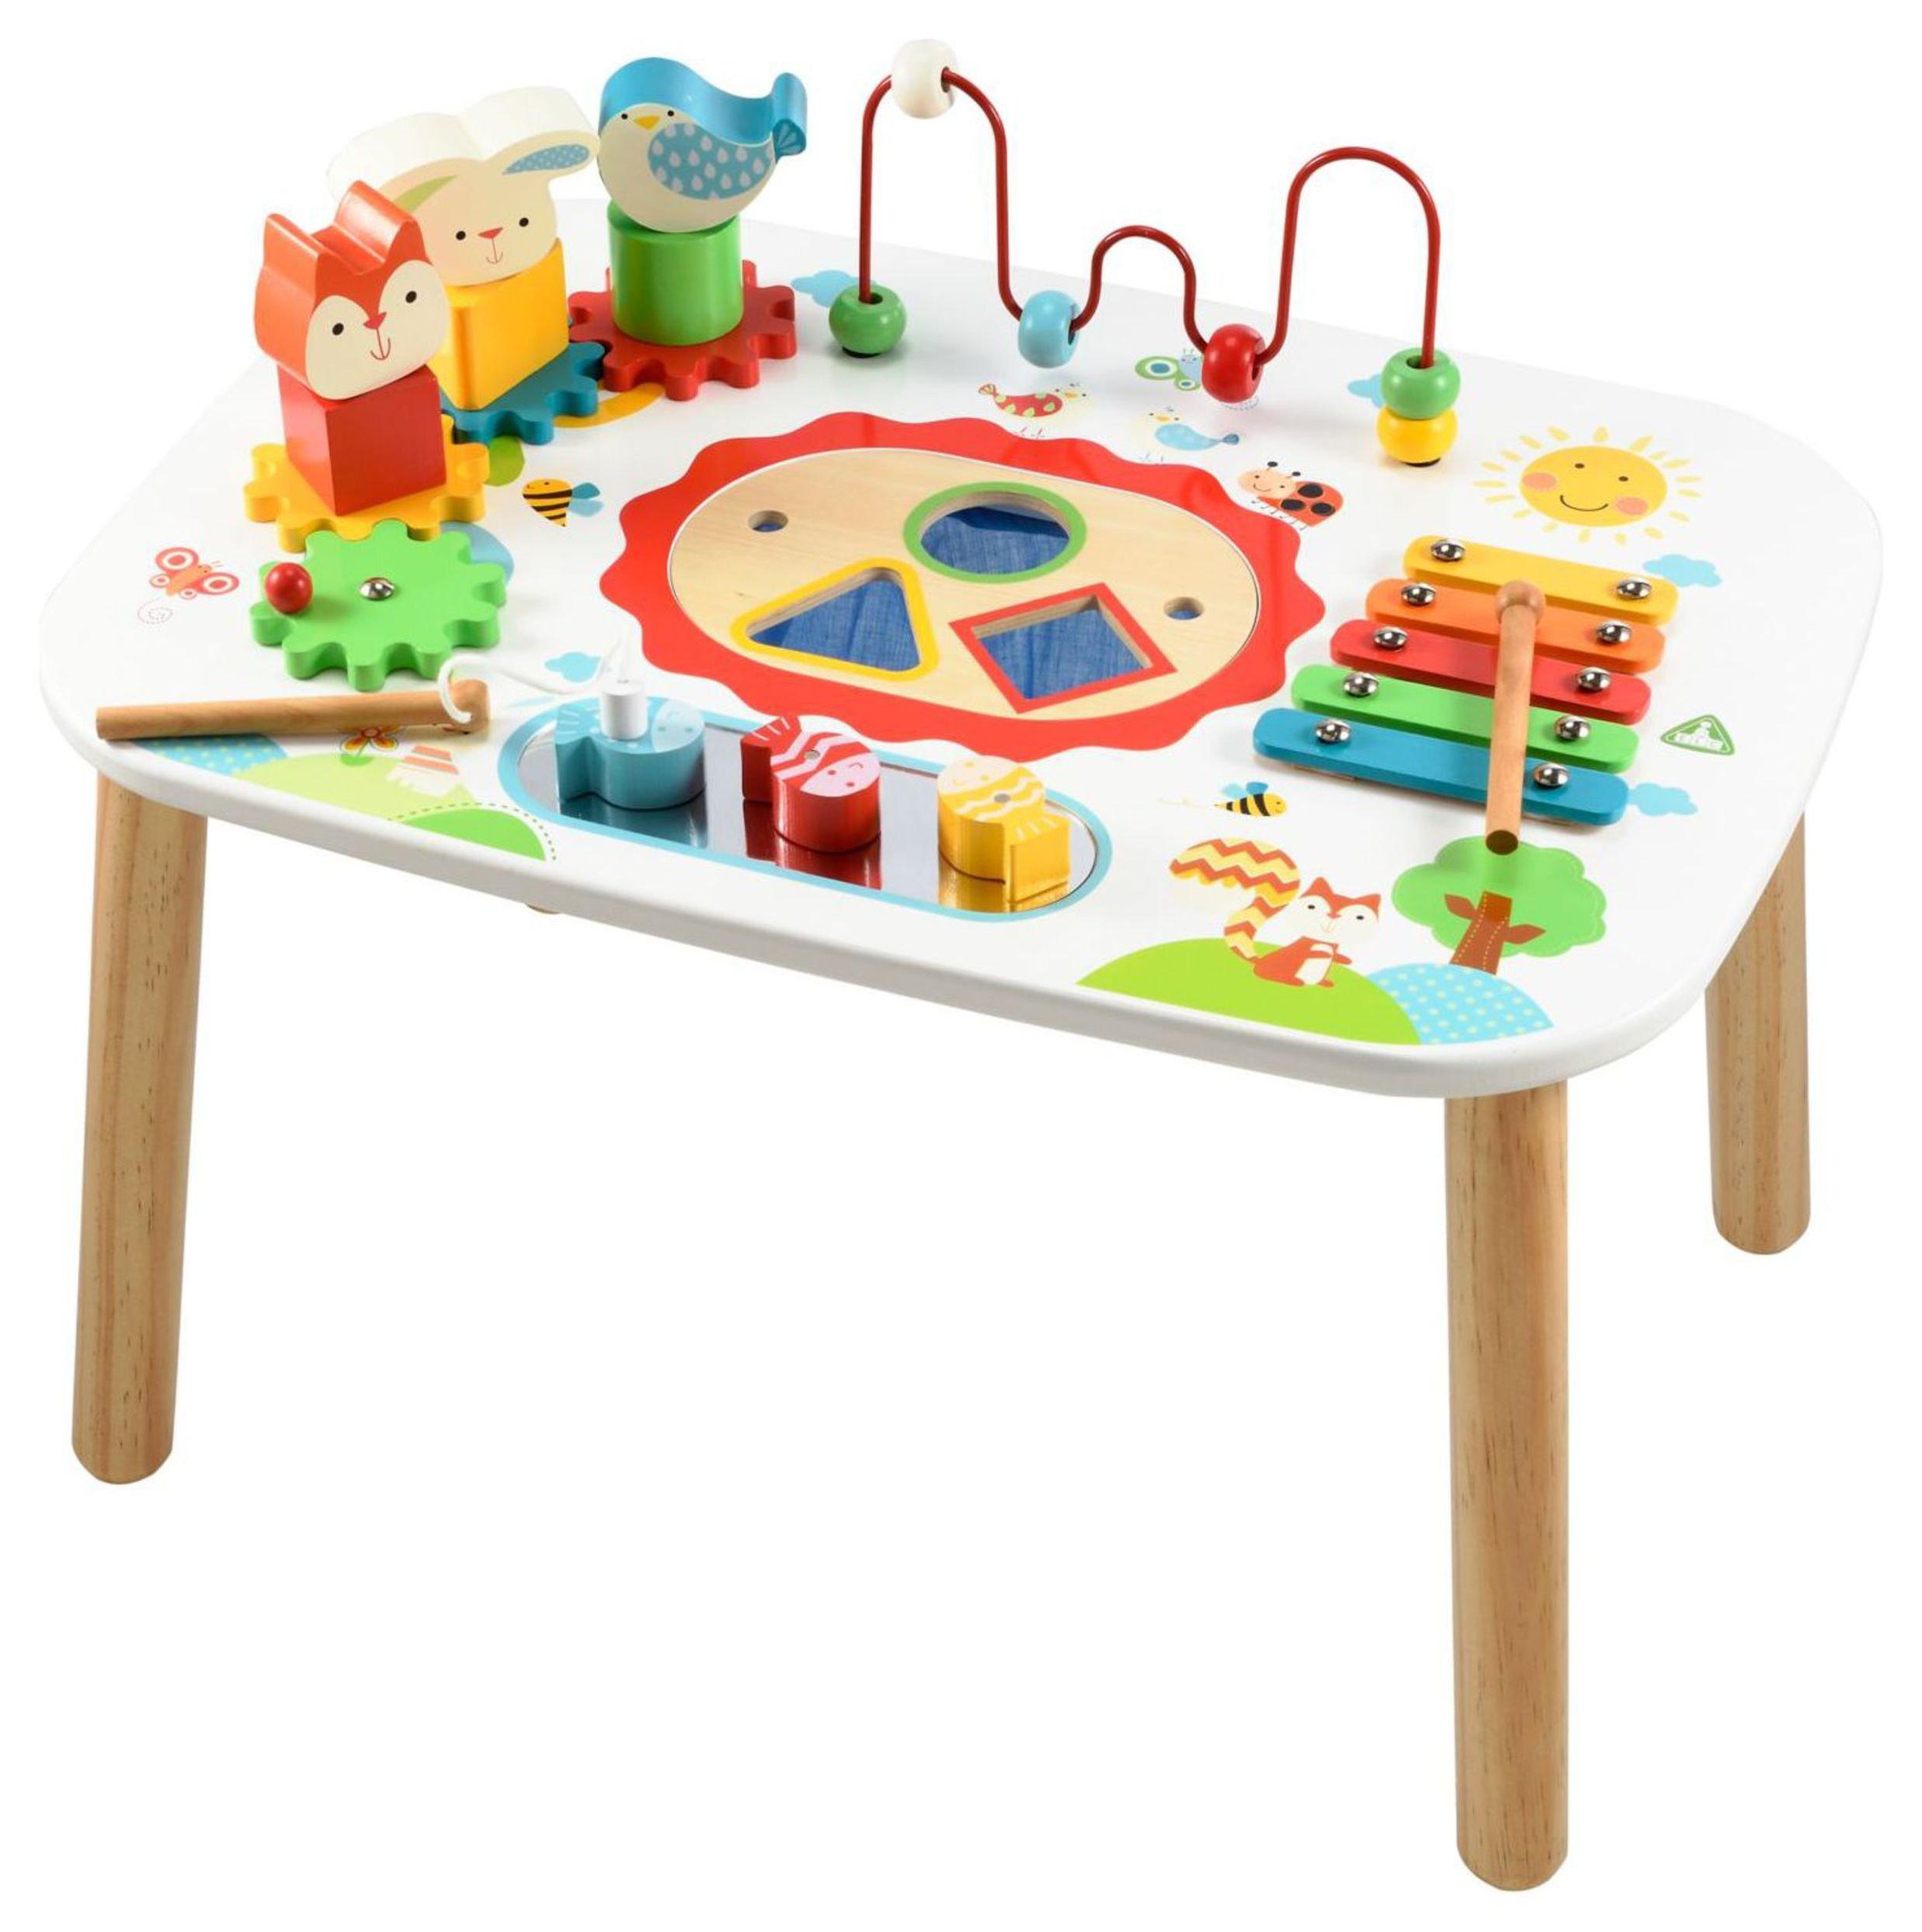 Elegant ELC Wooden Activity Table743/4002